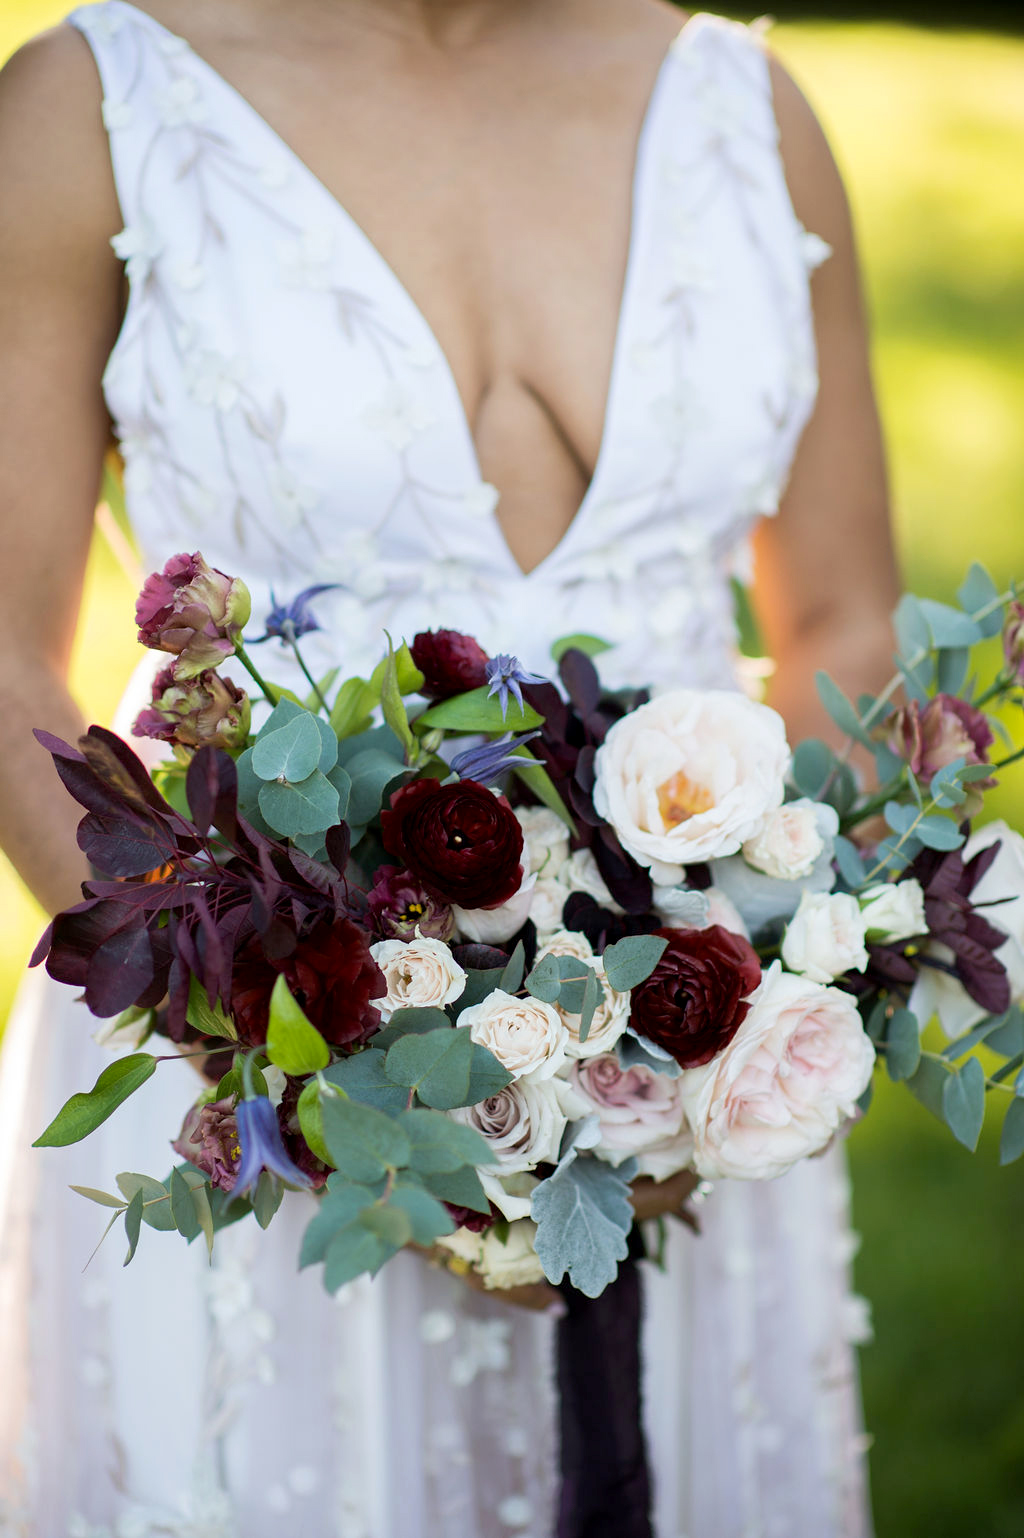 pale blush and deep eggplant colored floral bouquet